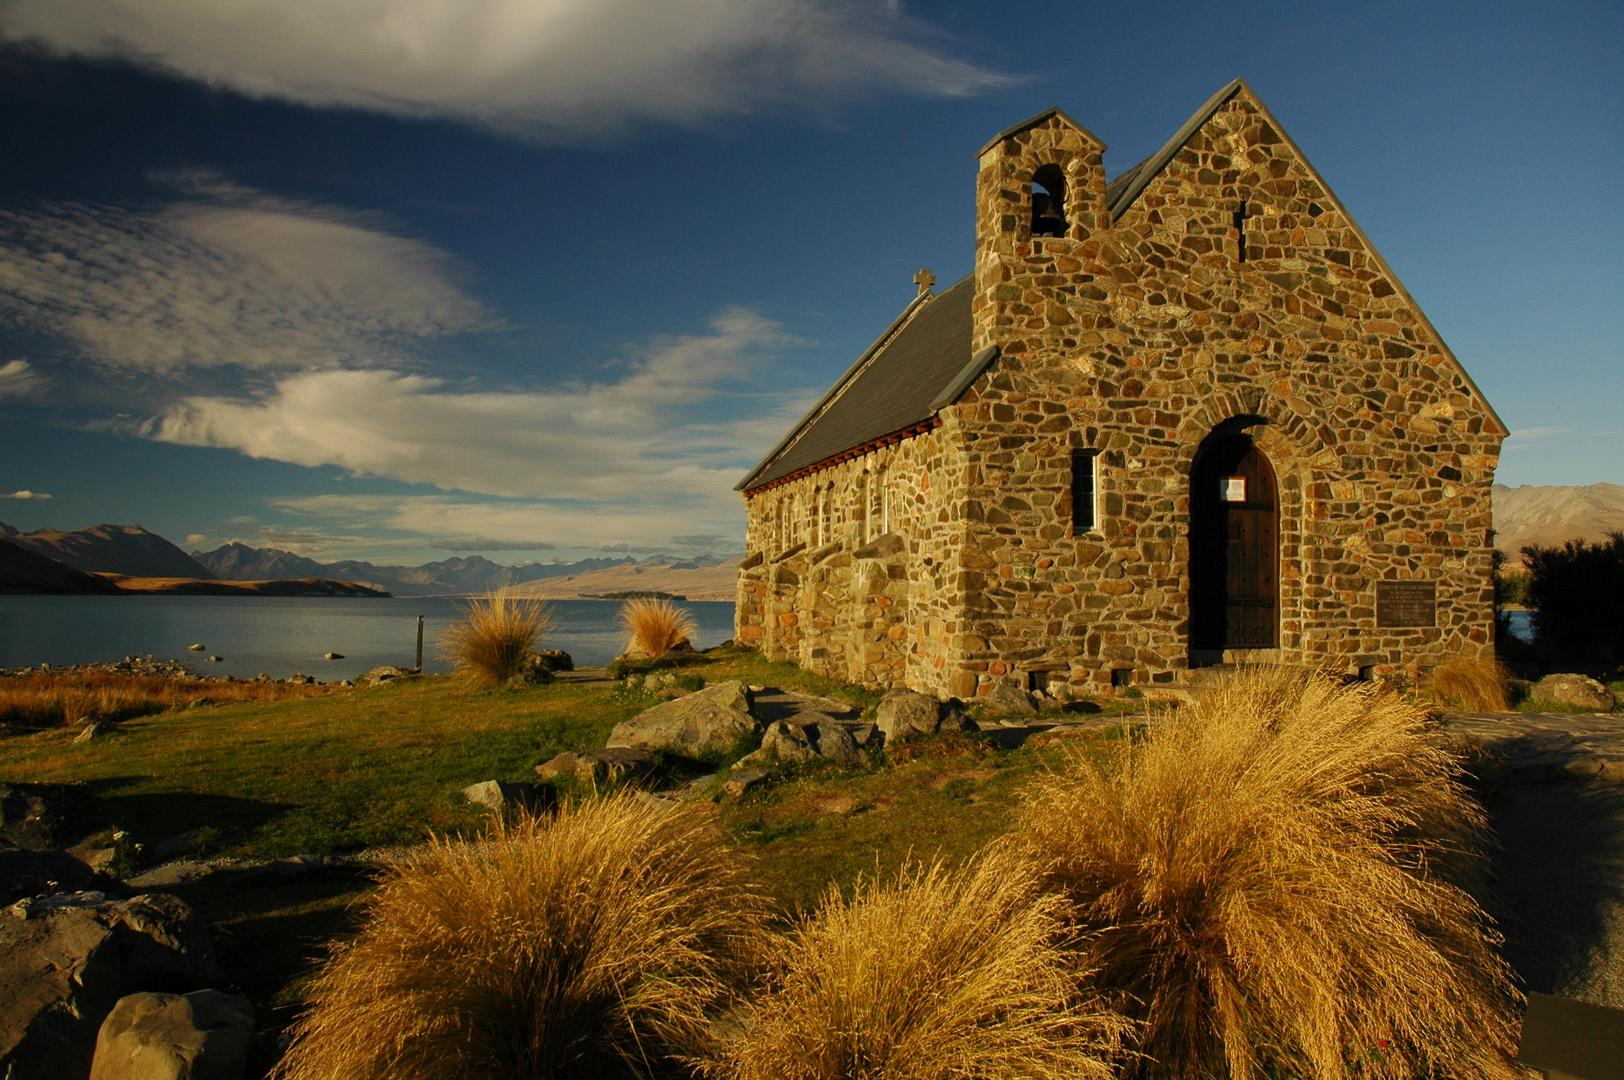 Church of the Good Shephard, Lake Tekapo